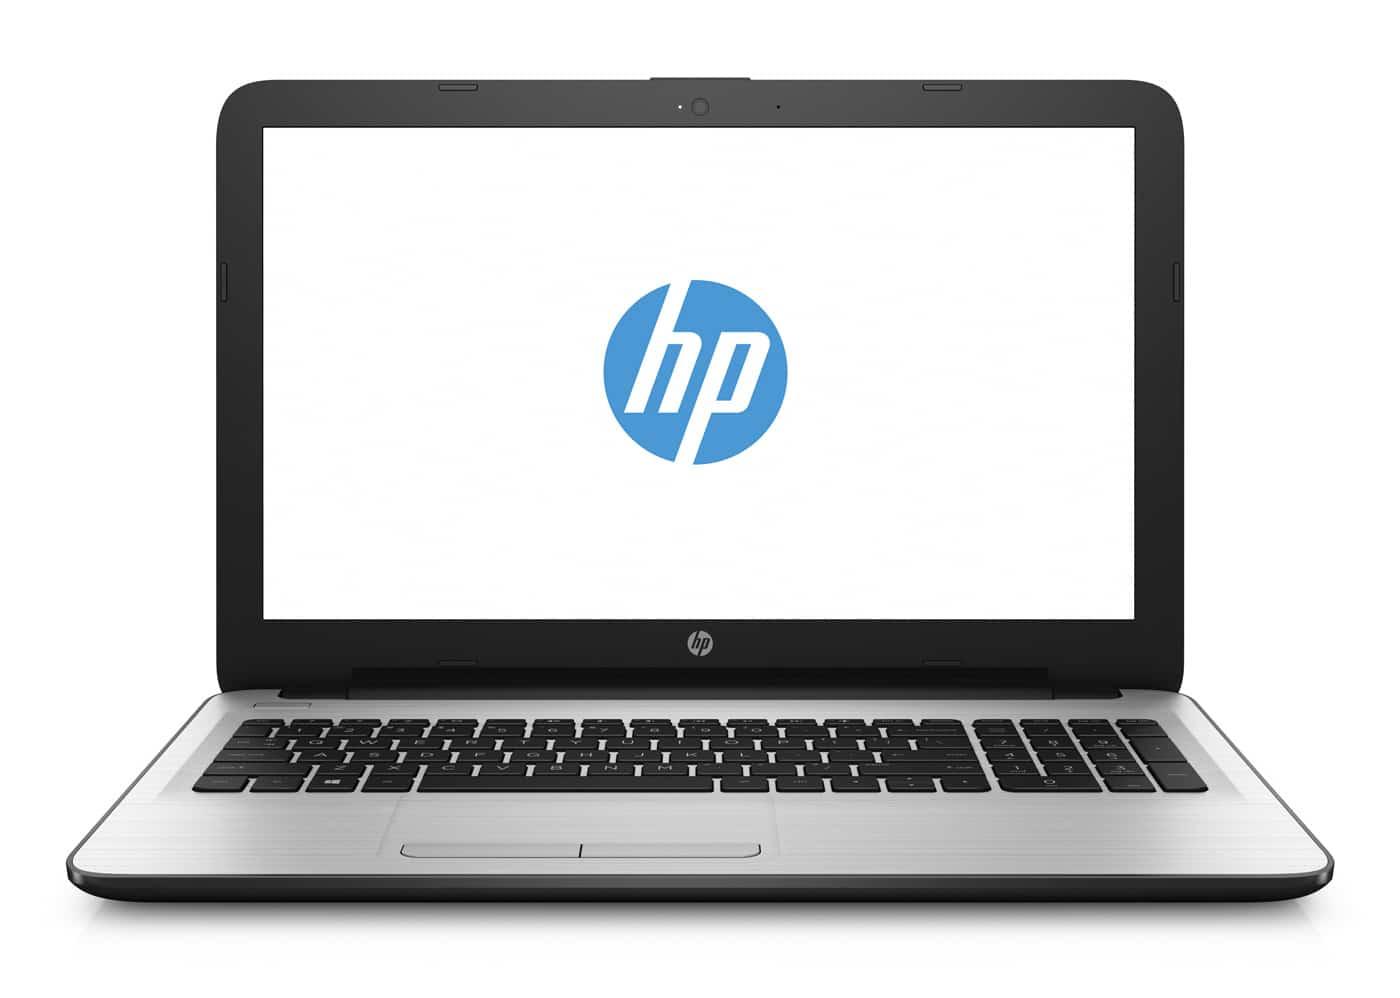 HP 15-ay025nf à 529€, PC portable 15 pouces Core i5 Radeon 1 To argent